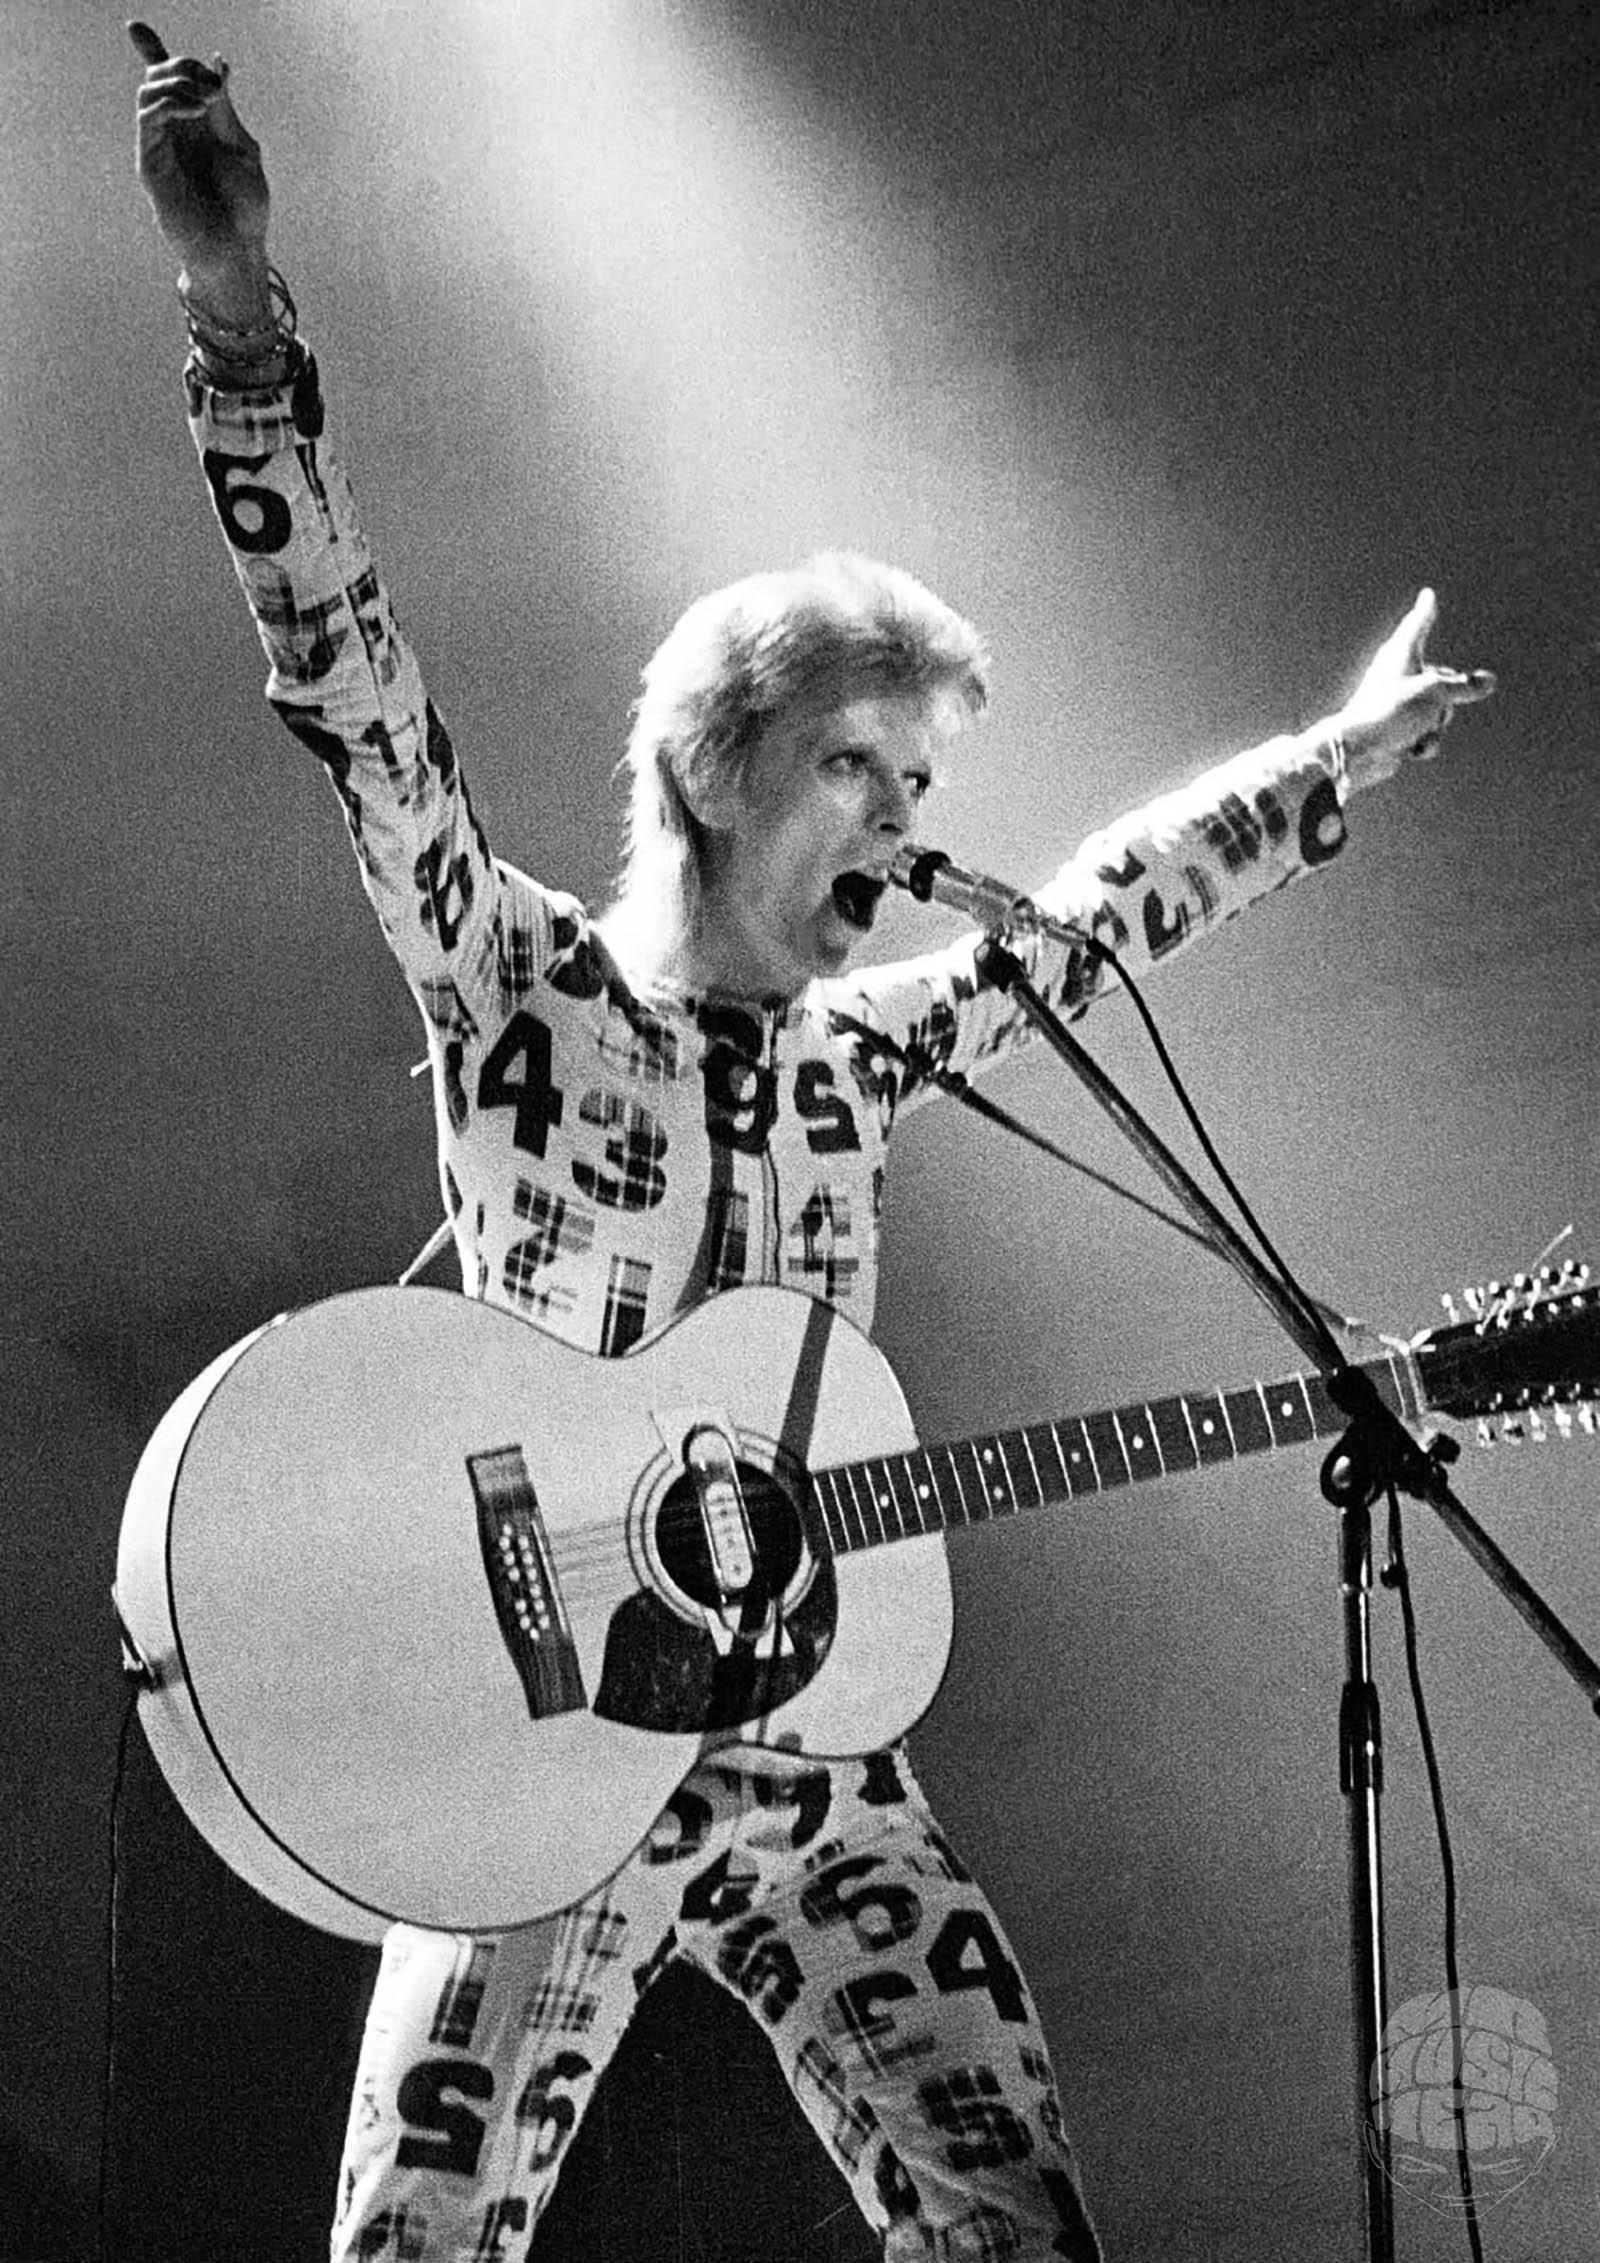 ian dickson_David Bowie 1973.jpg